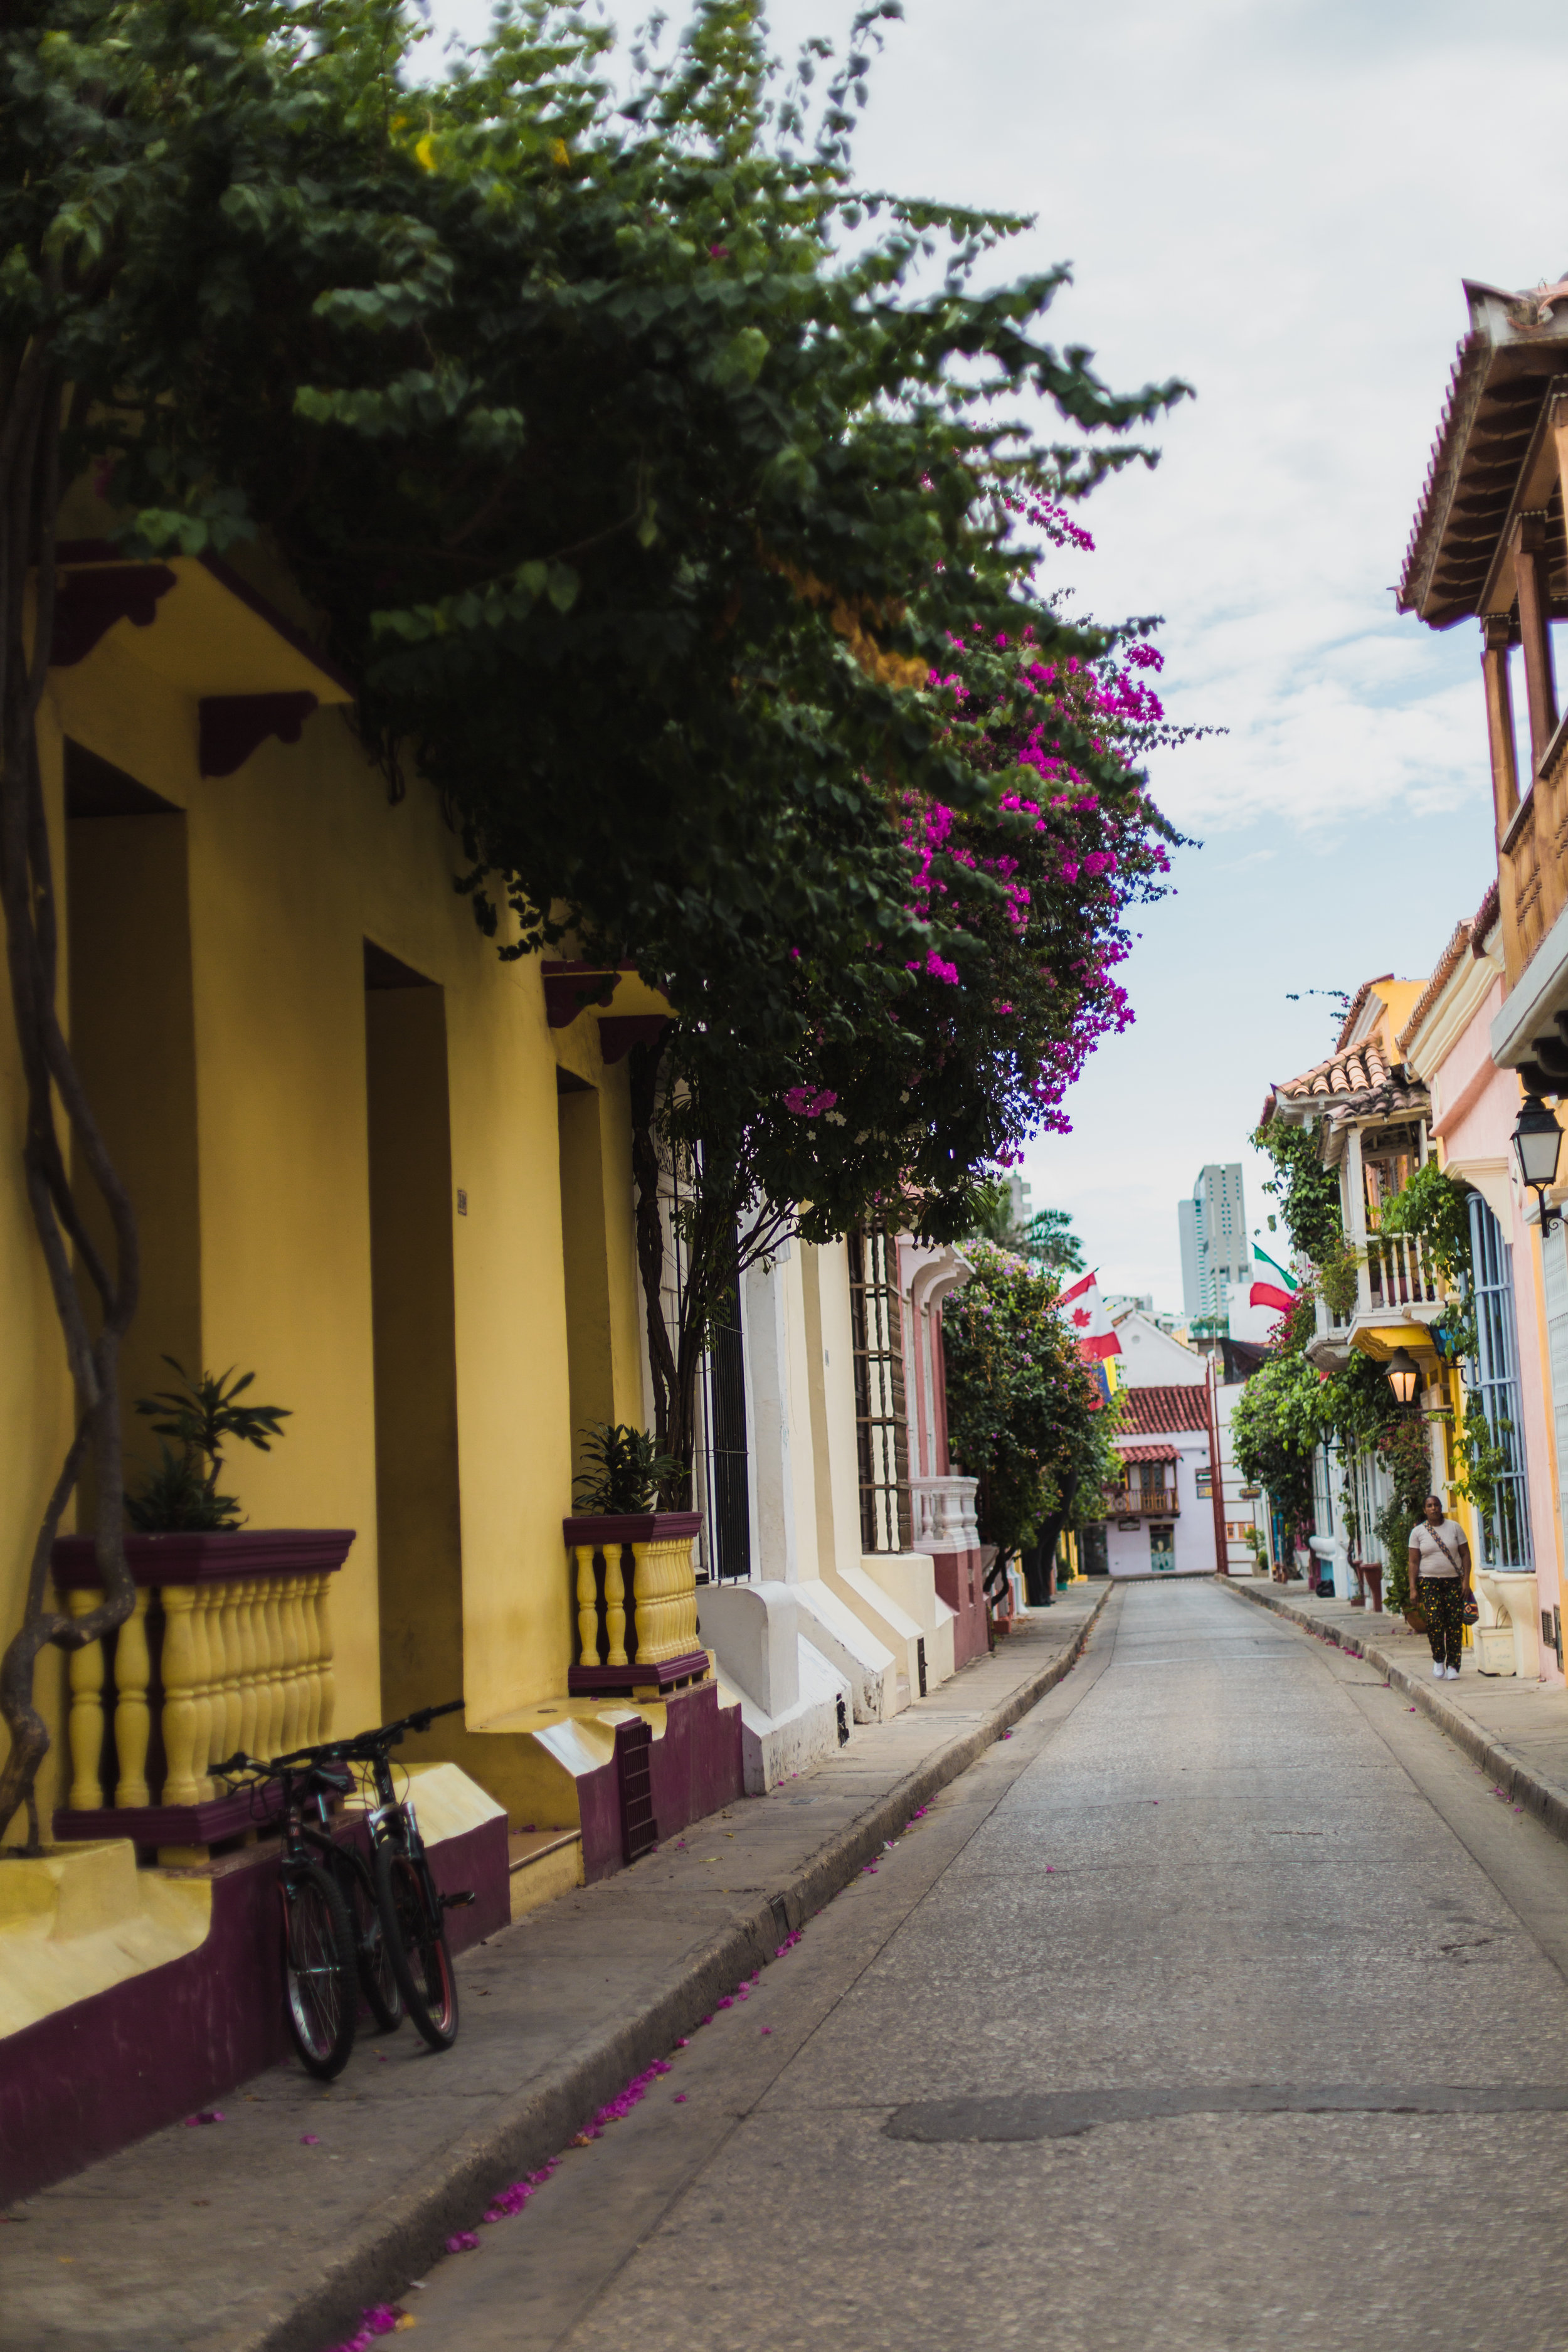 Colombia_Cartegena_2017_5.JPG